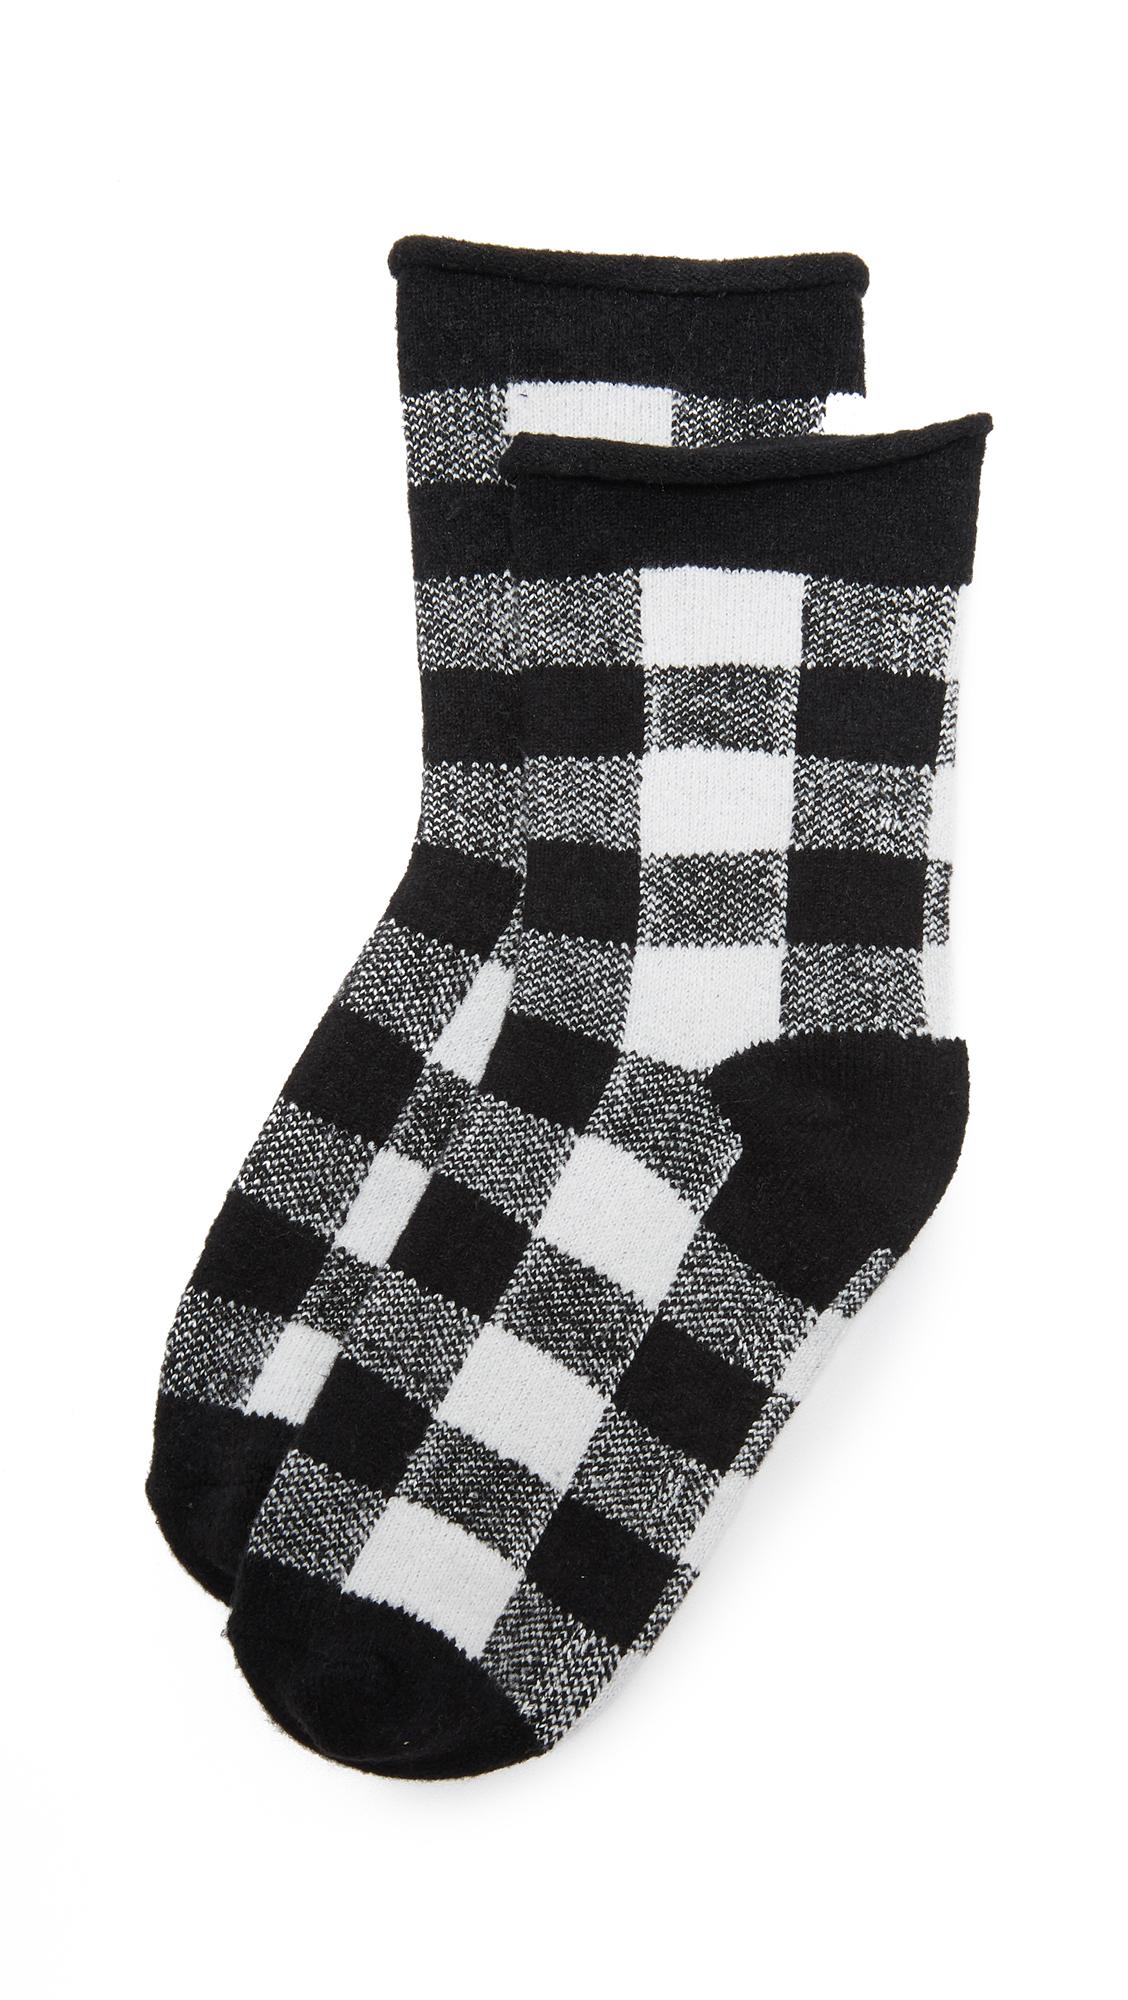 Plush Rolled Fleece Plaid Socks